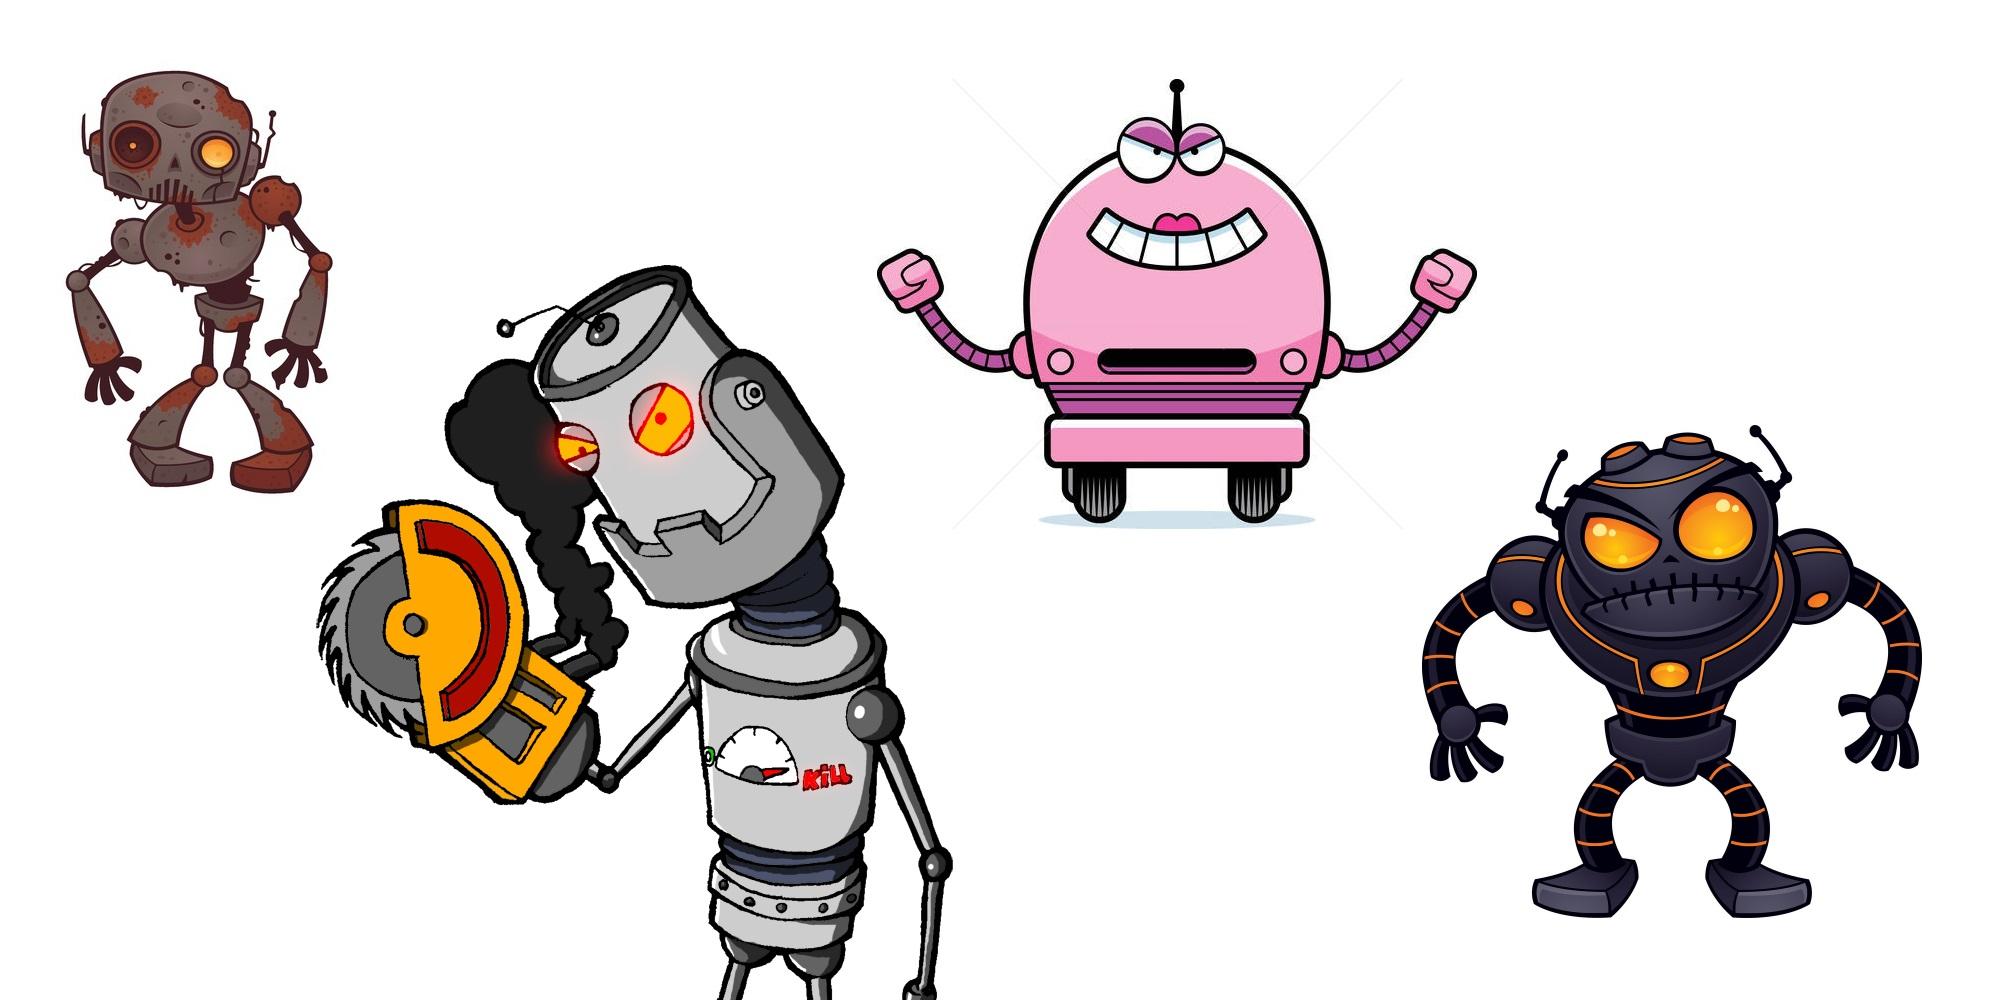 Malevolent Robots